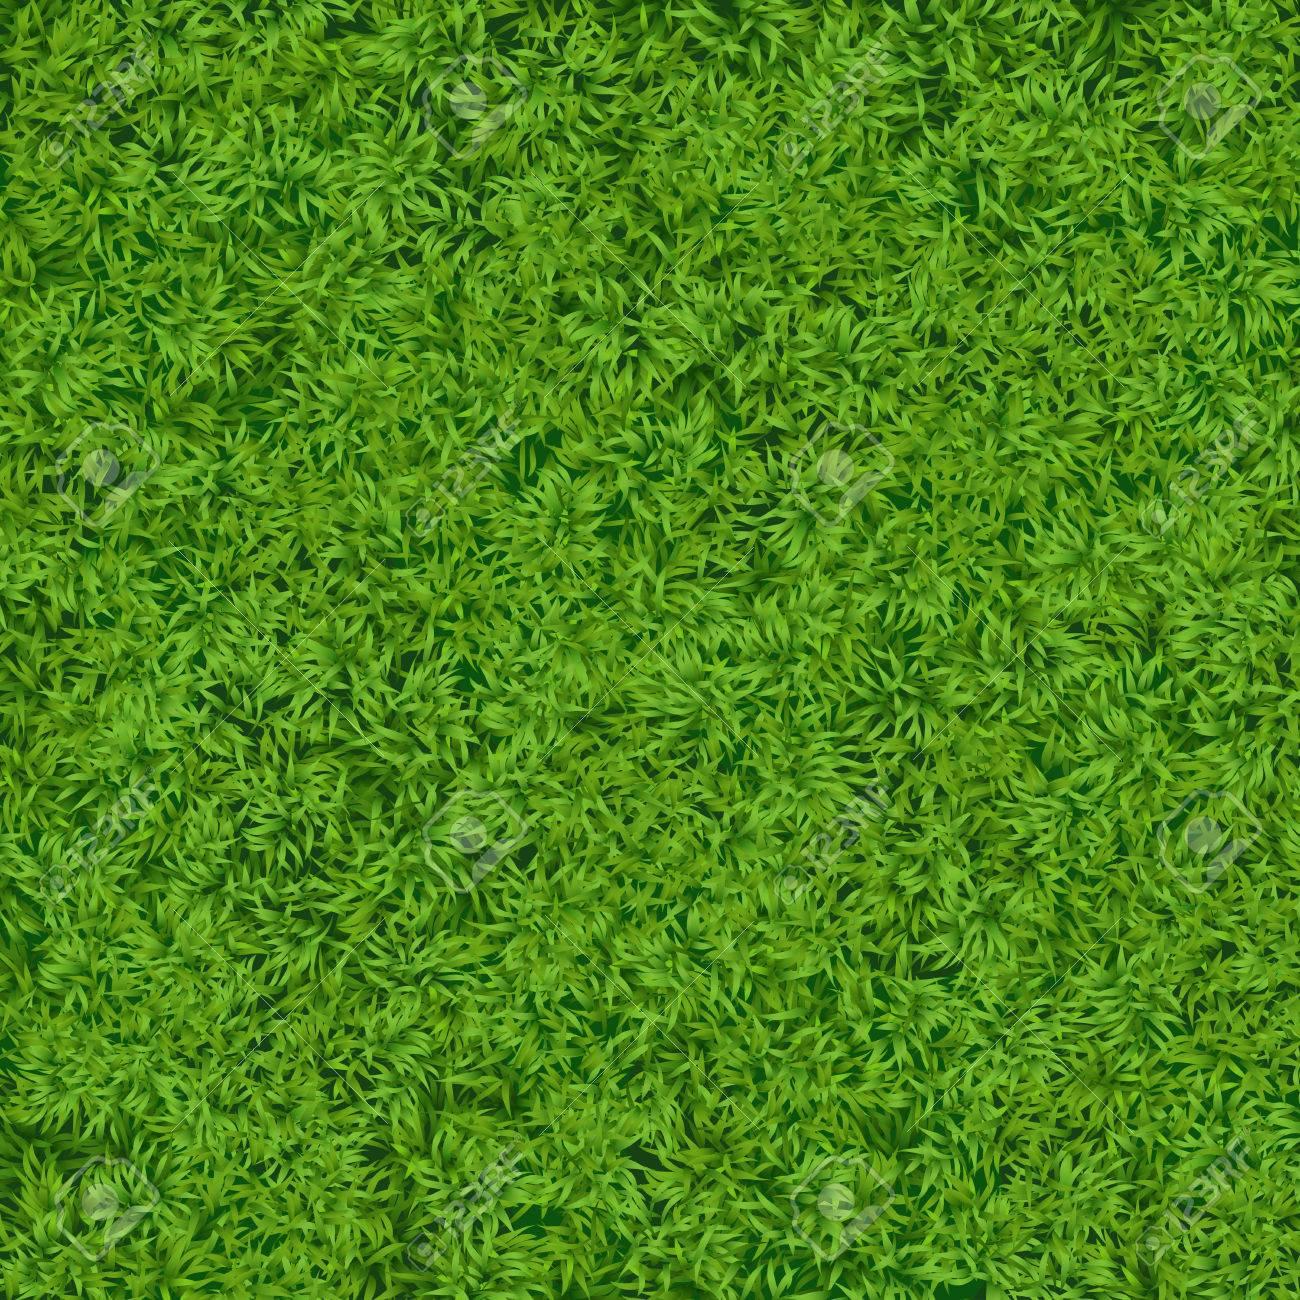 Natural Realistic Green Grass Texture Background. Soccer Grass ...